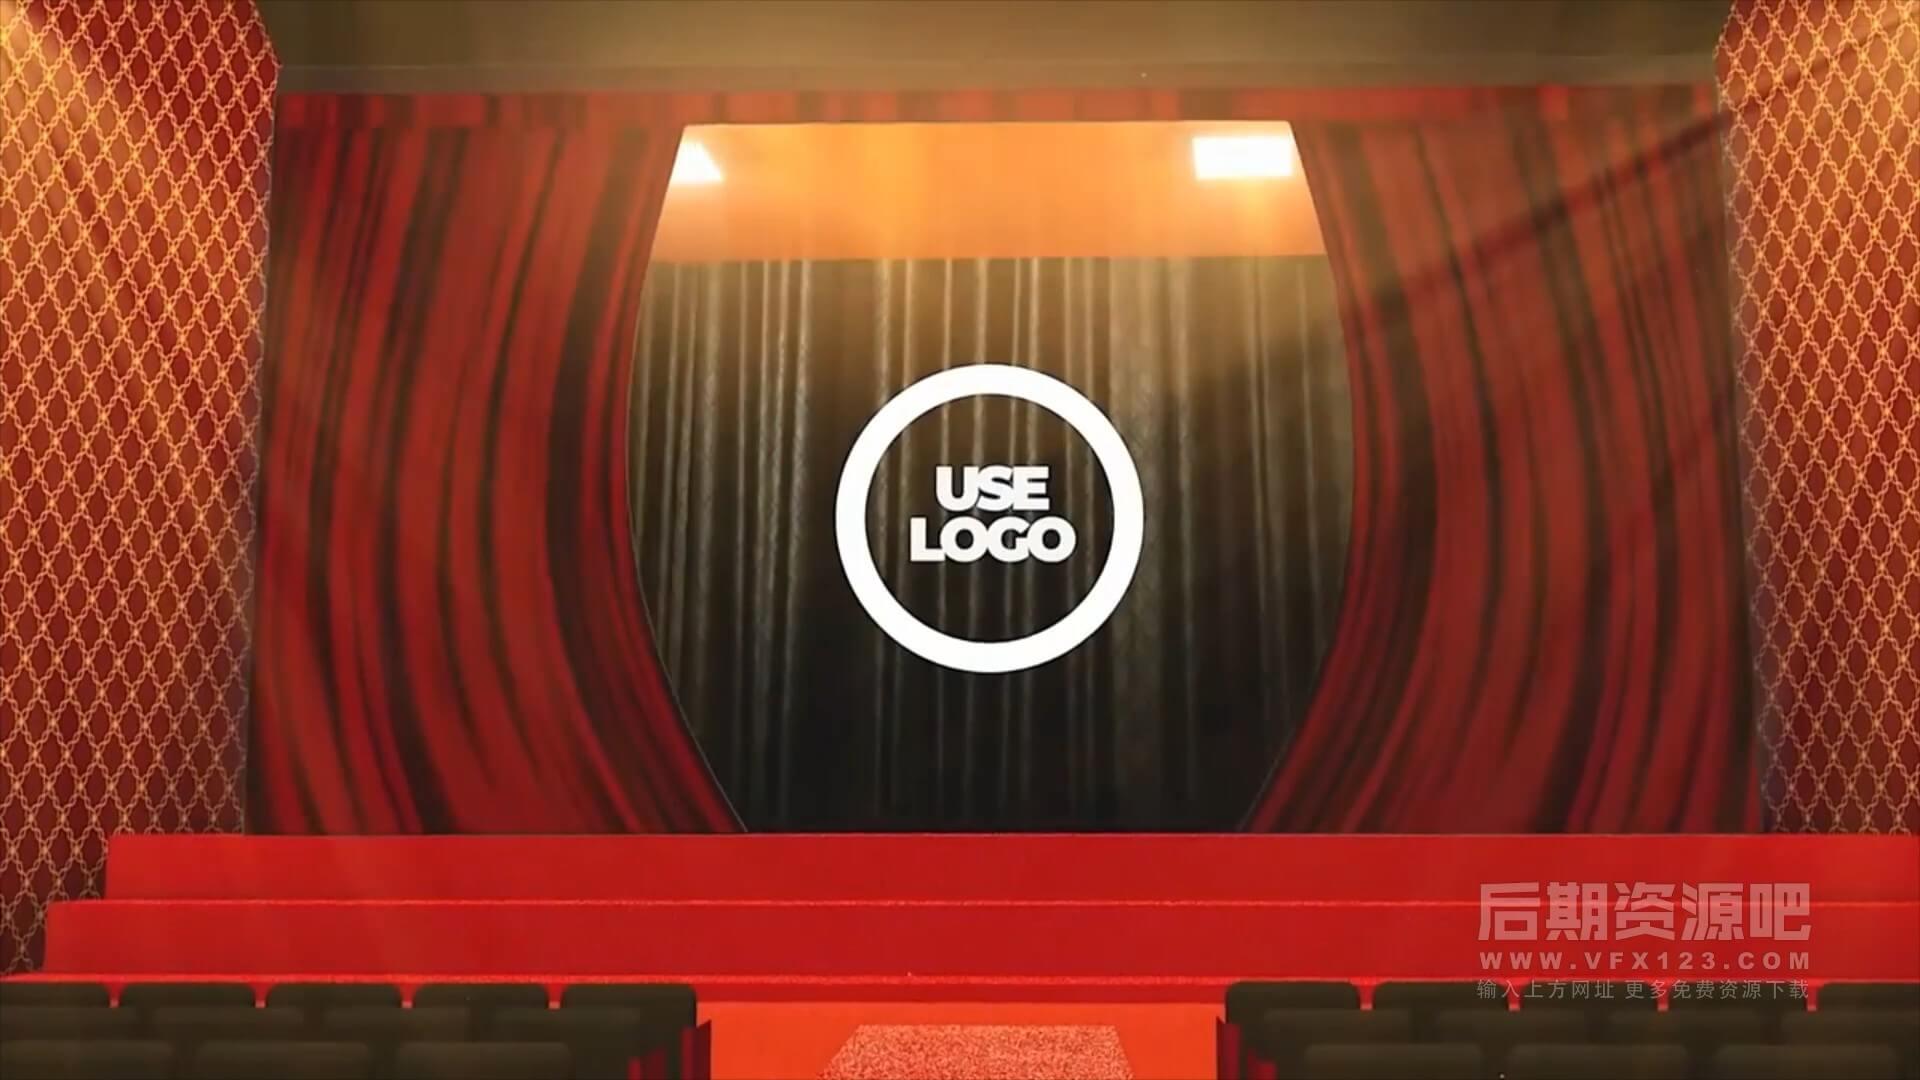 fcpx插件 影院红色大幕拉开动画徽标LOGO展示模板 Theater Logo reveal